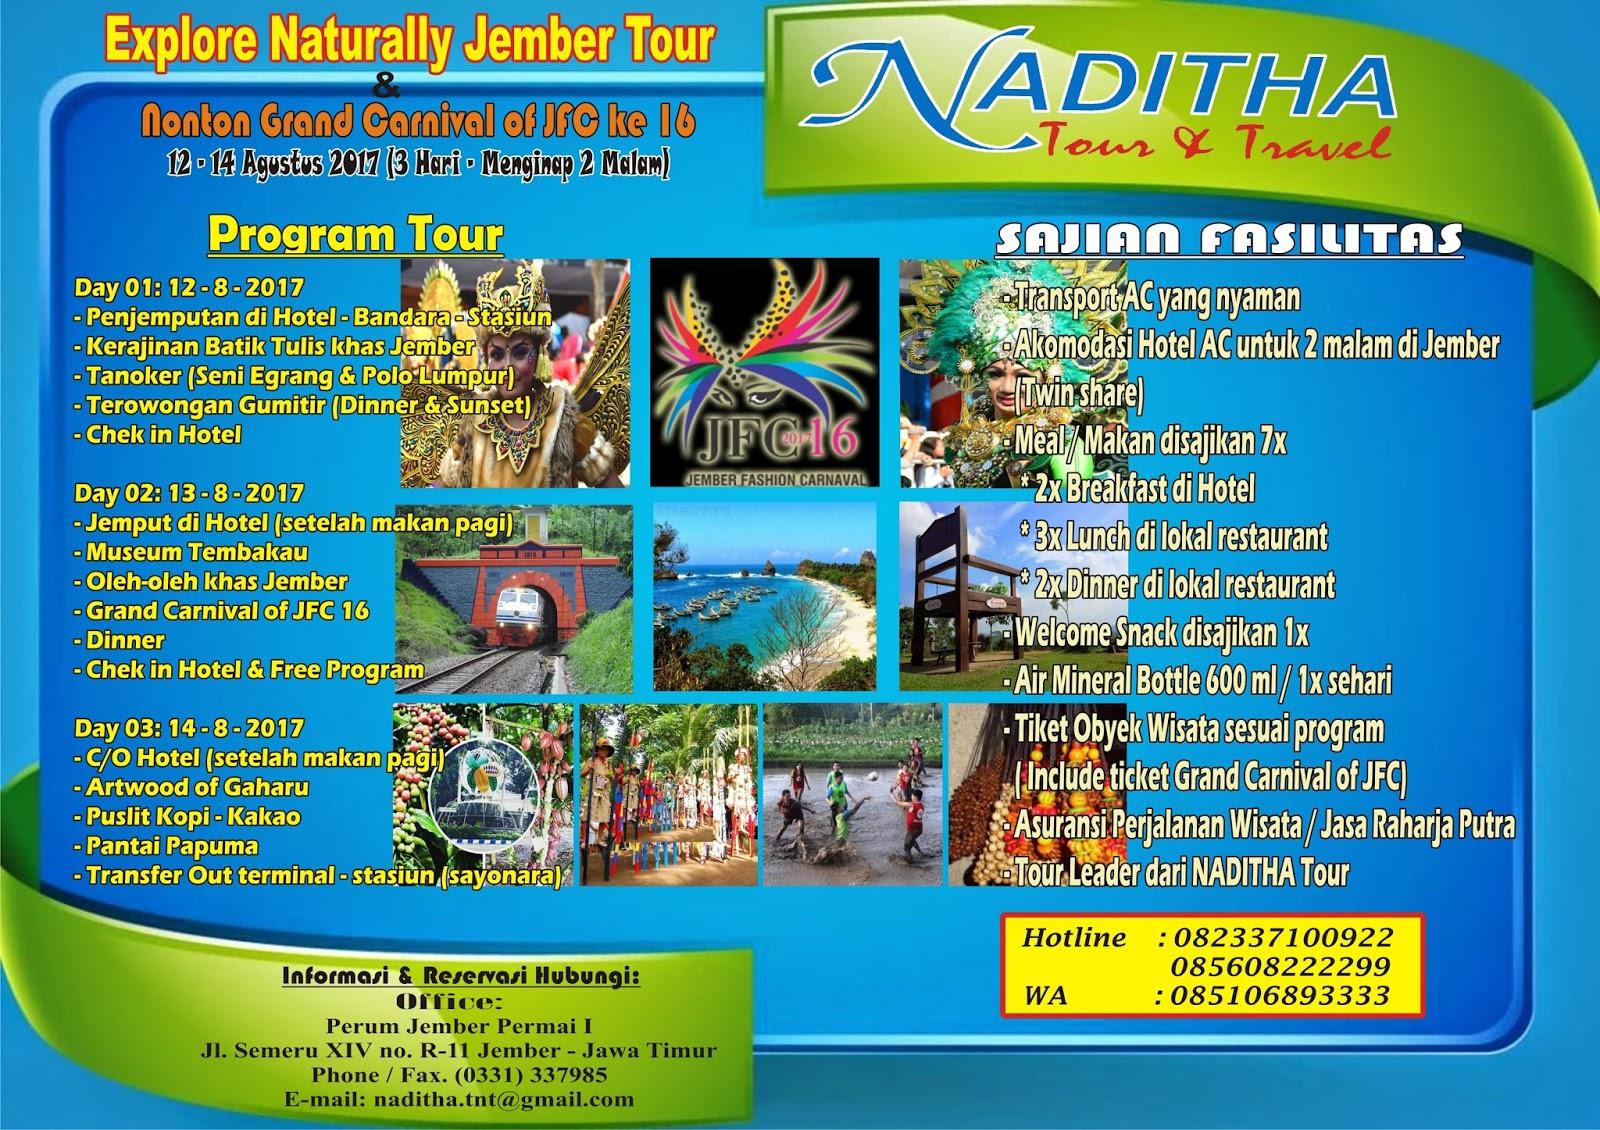 Naditha Prima Citra Wisata Juni 2017 Explore Naturally Jember Grand